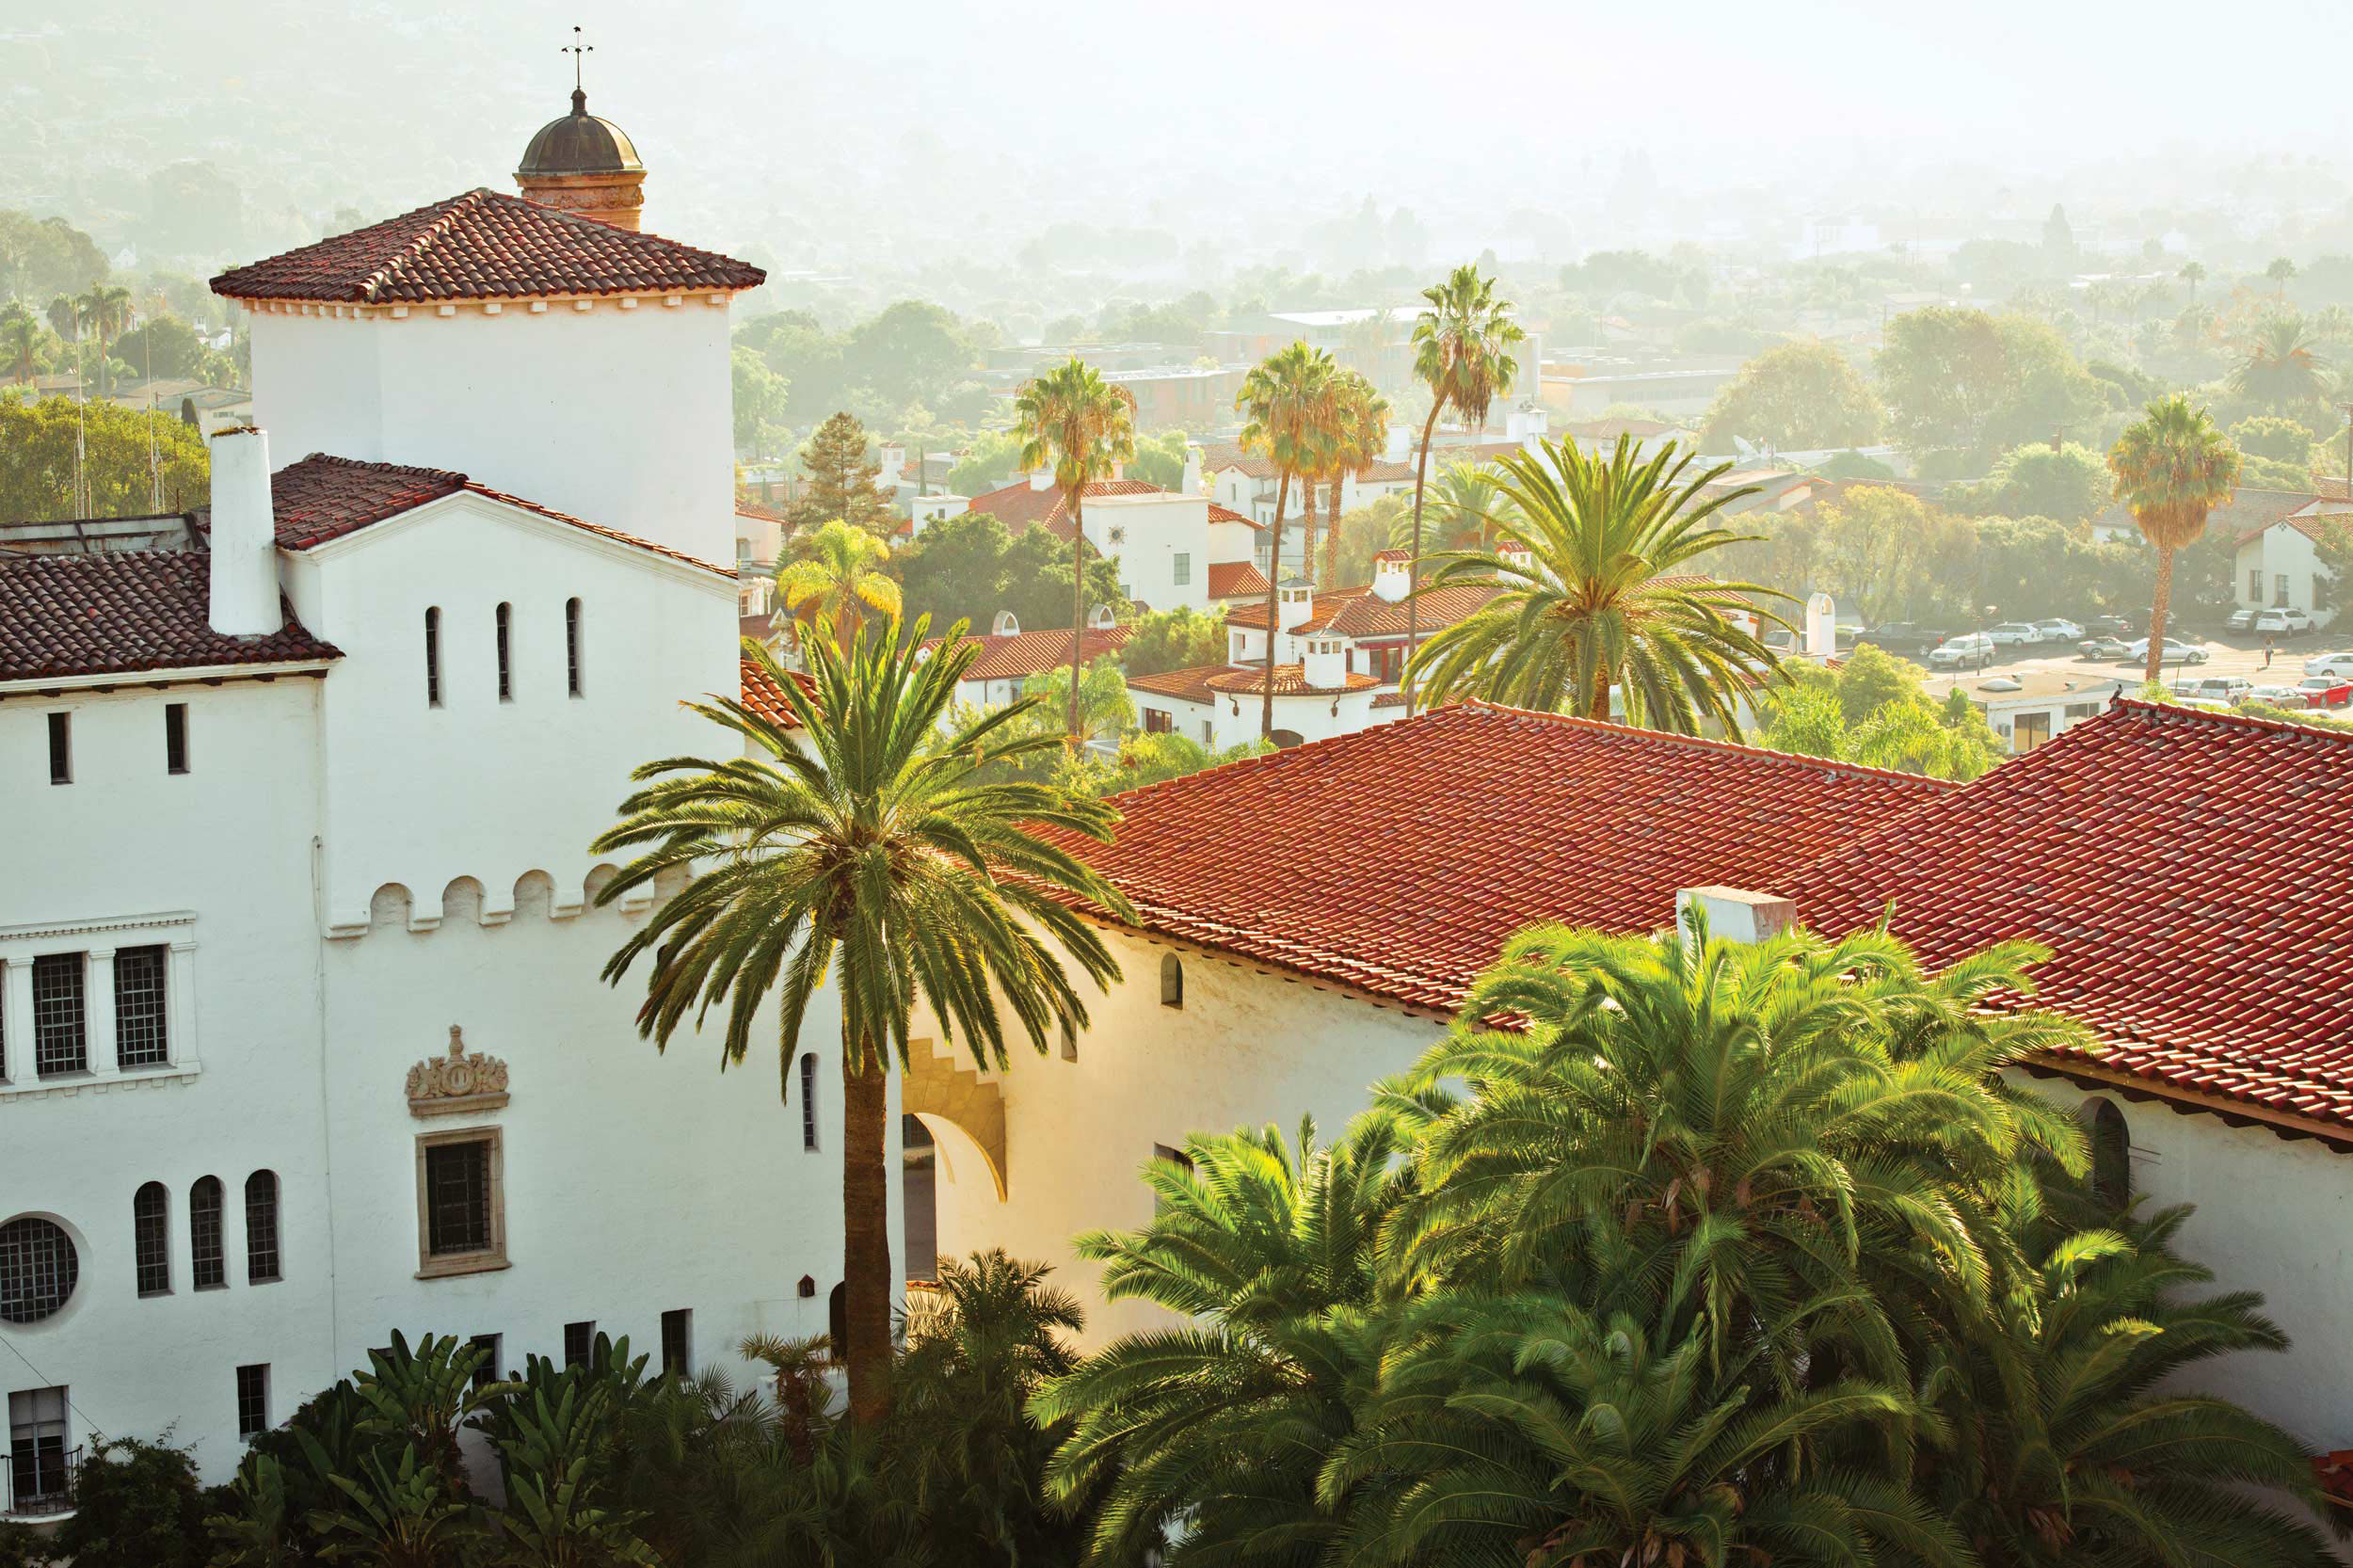 The Santa Barbara Courthouse, near downtown.